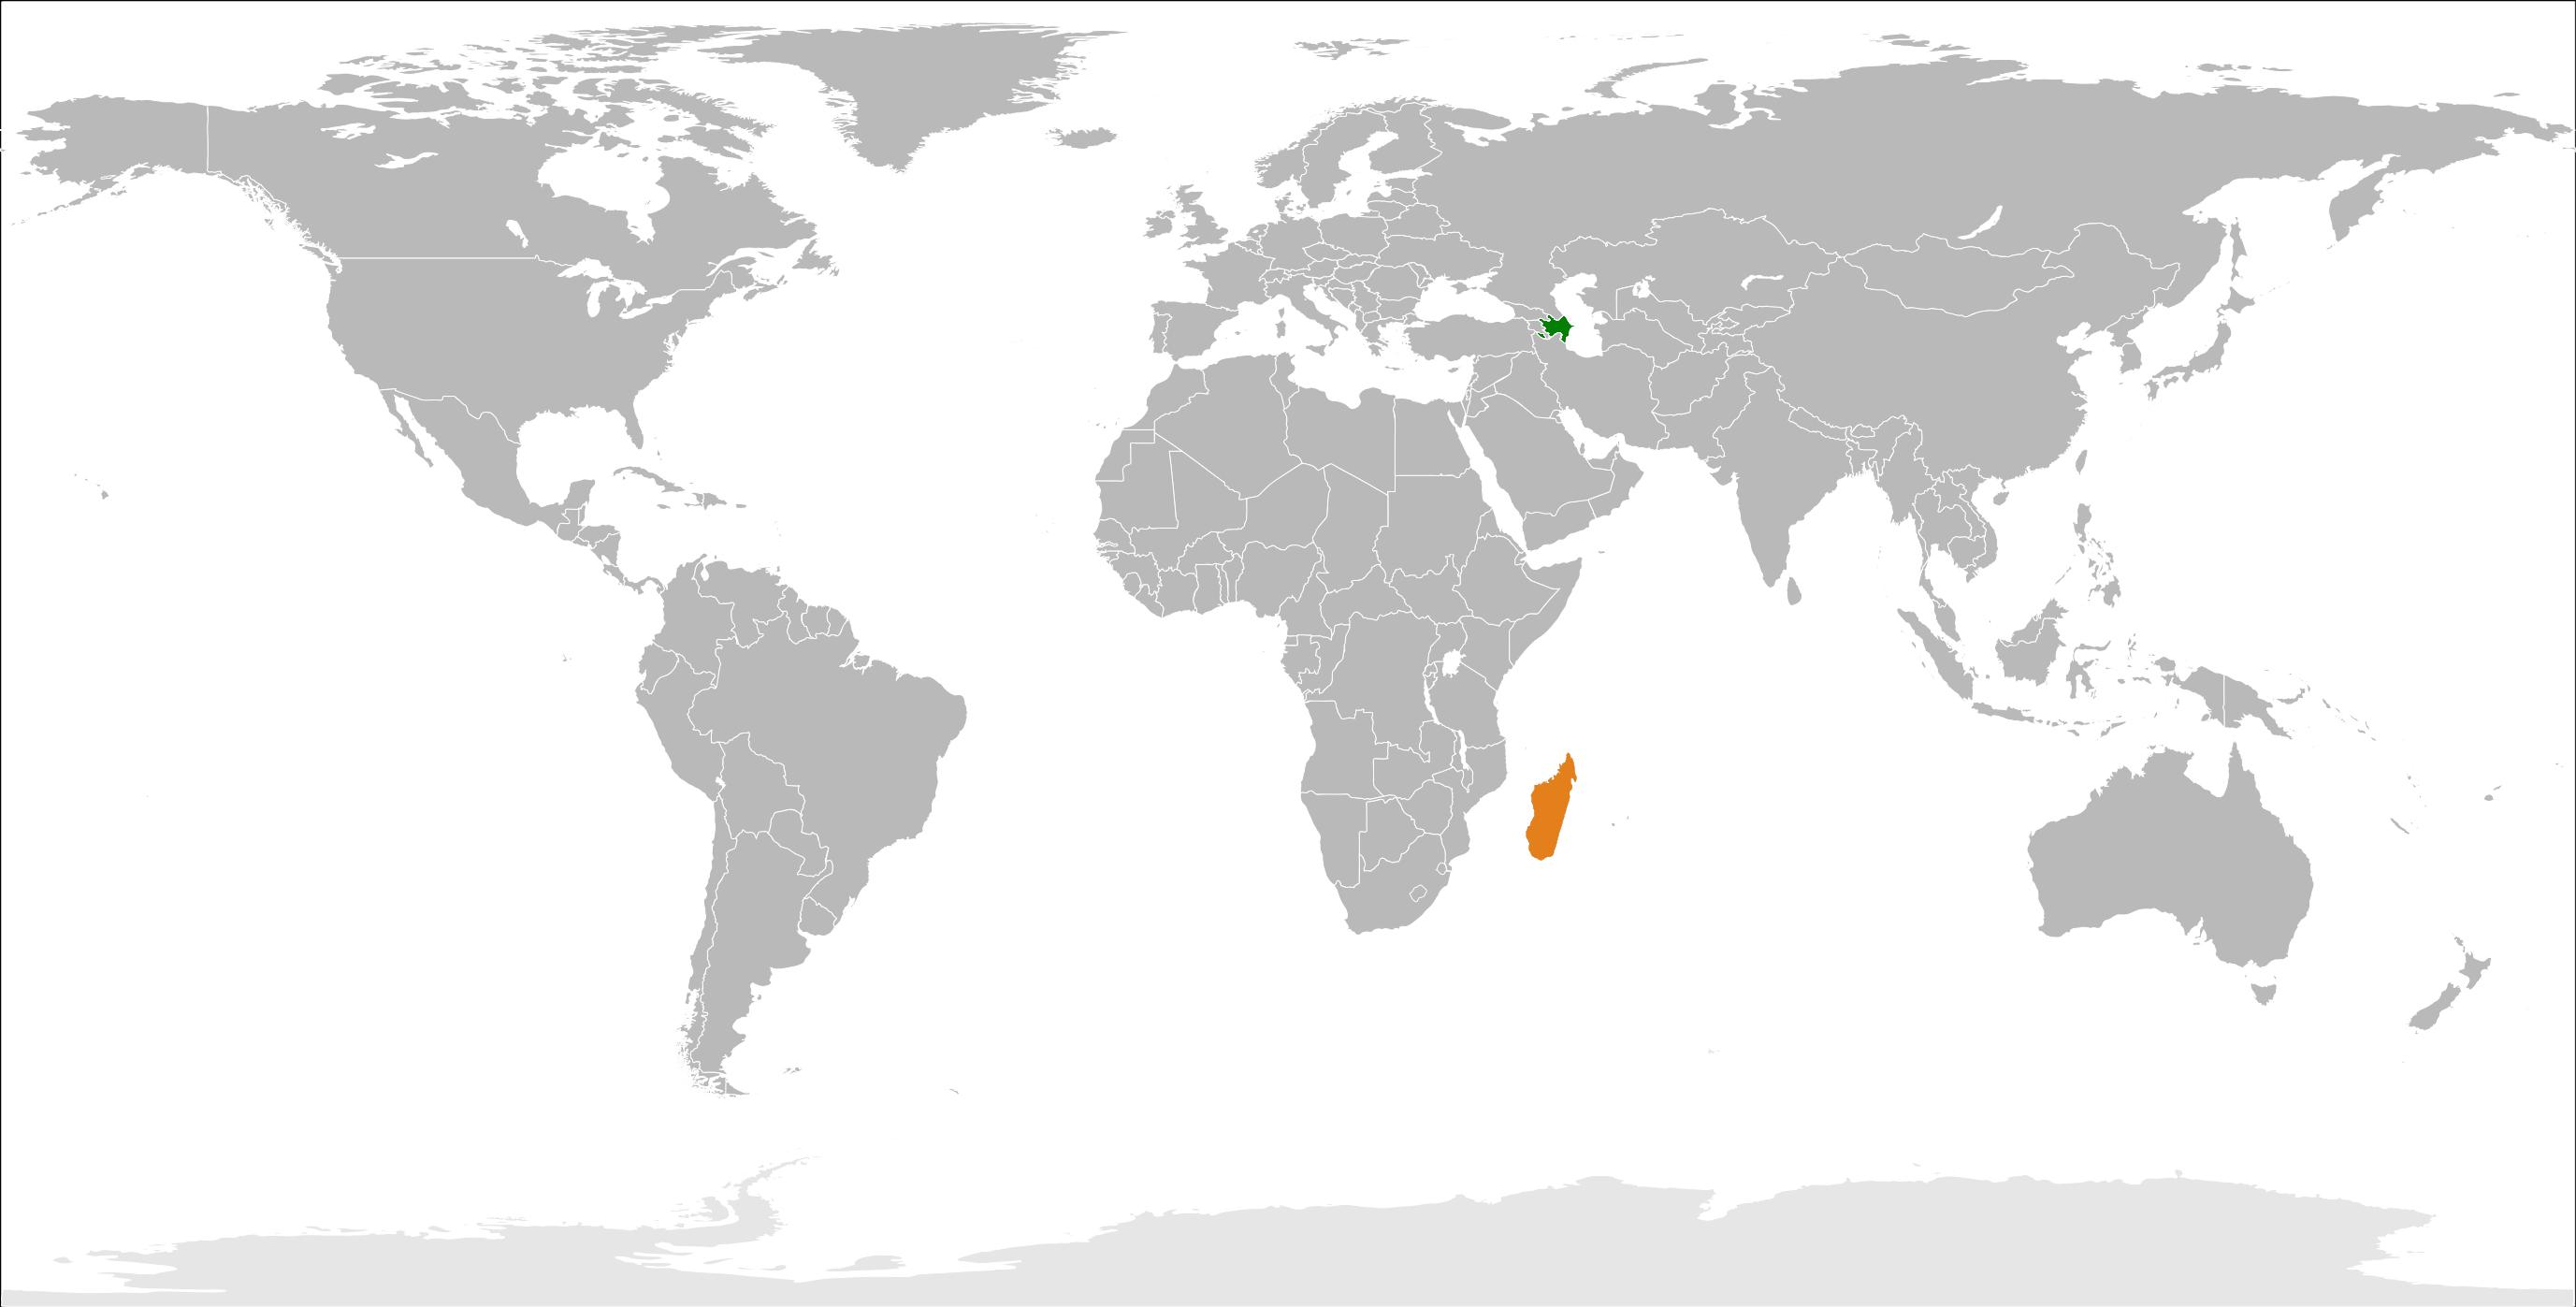 File:Azerbaijan Madagascar Locator.png - Wikimedia Commons